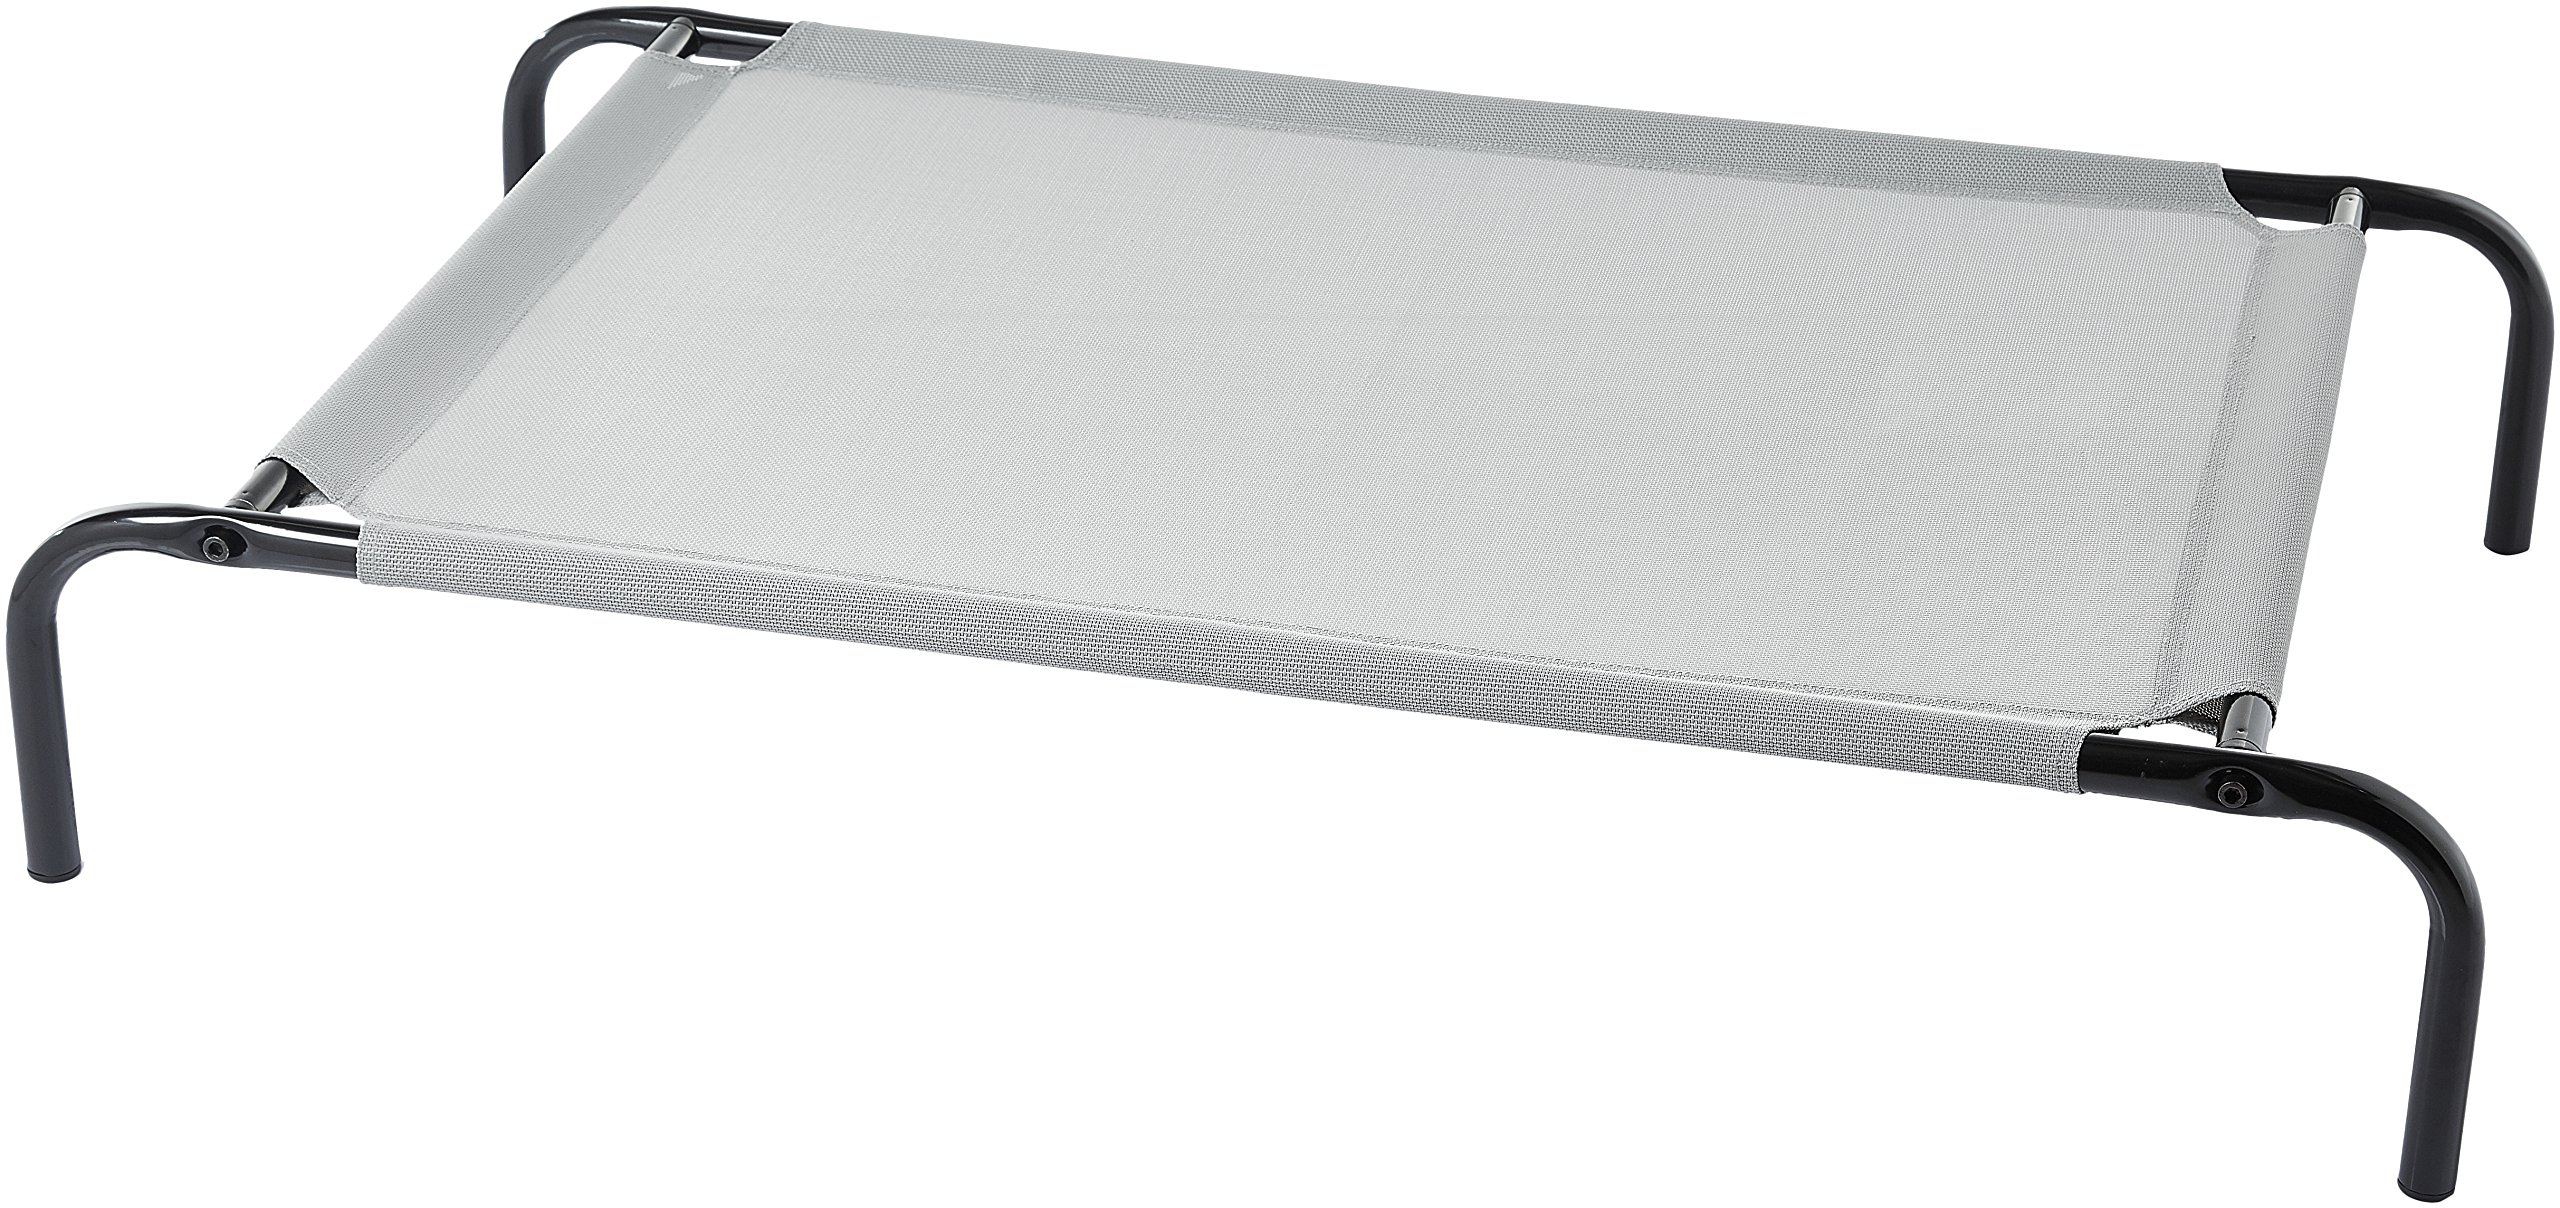 AmazonBasics Cooling Elevated Pet Bed, Medium (43 x 26 x 7.5 Inches), Grey